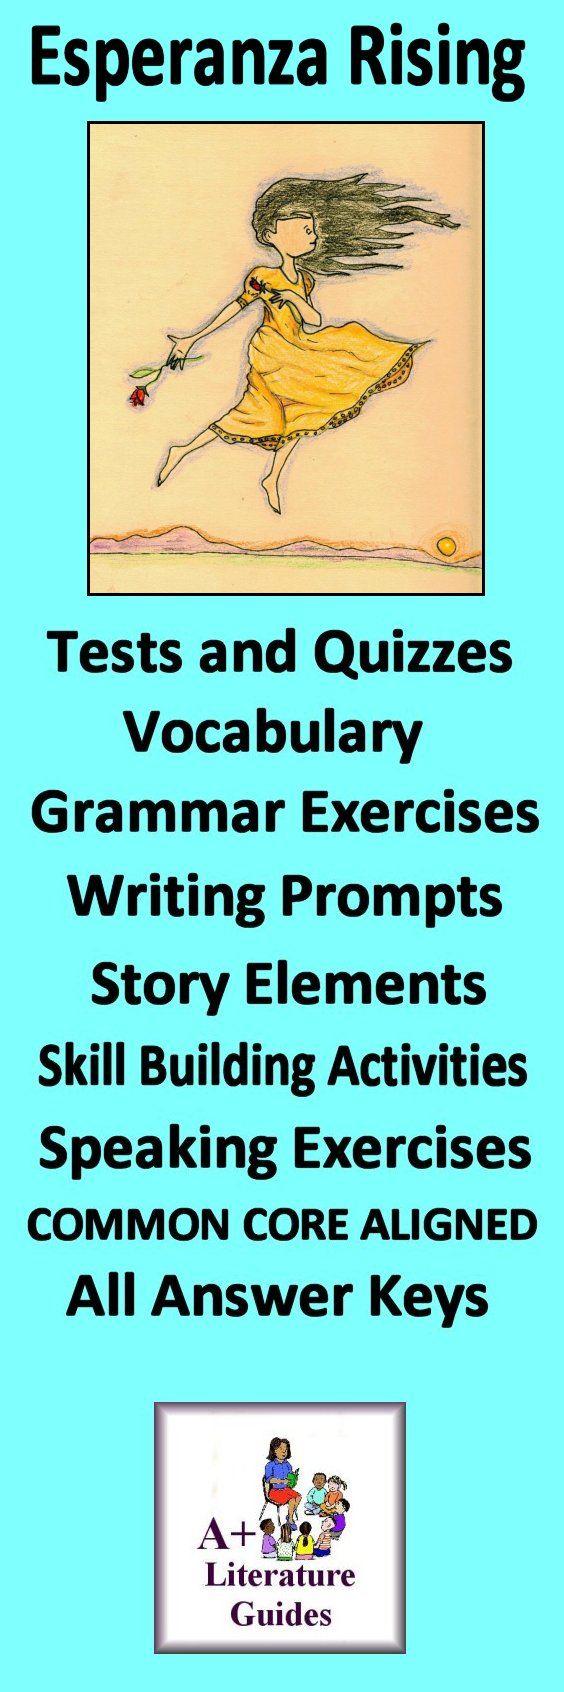 110 best English images on Pinterest | Kindergarten lesson plans ...